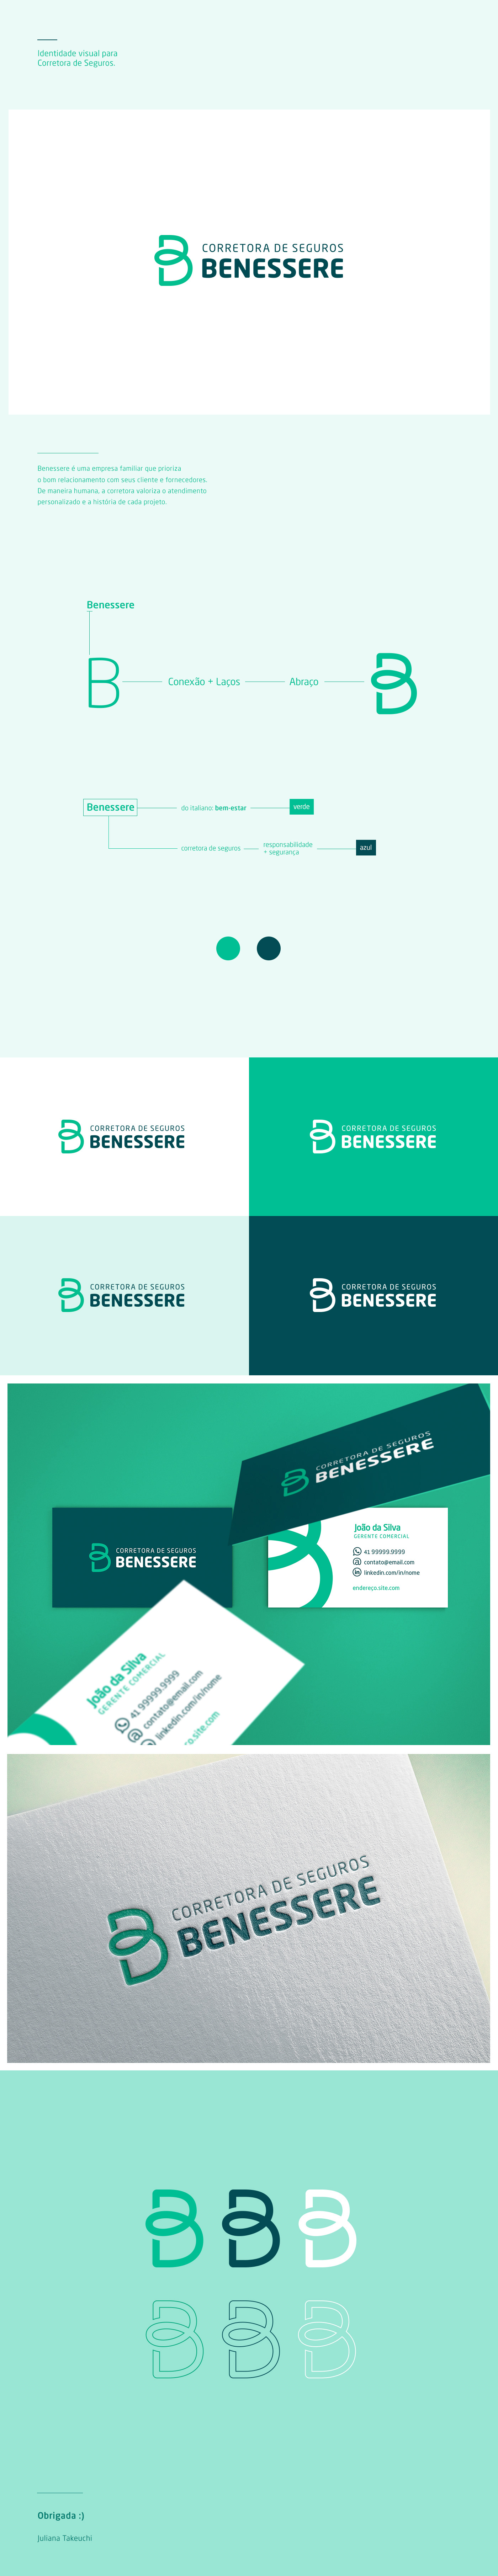 identity branding  logo ensurance broker green safe seguro Corretora